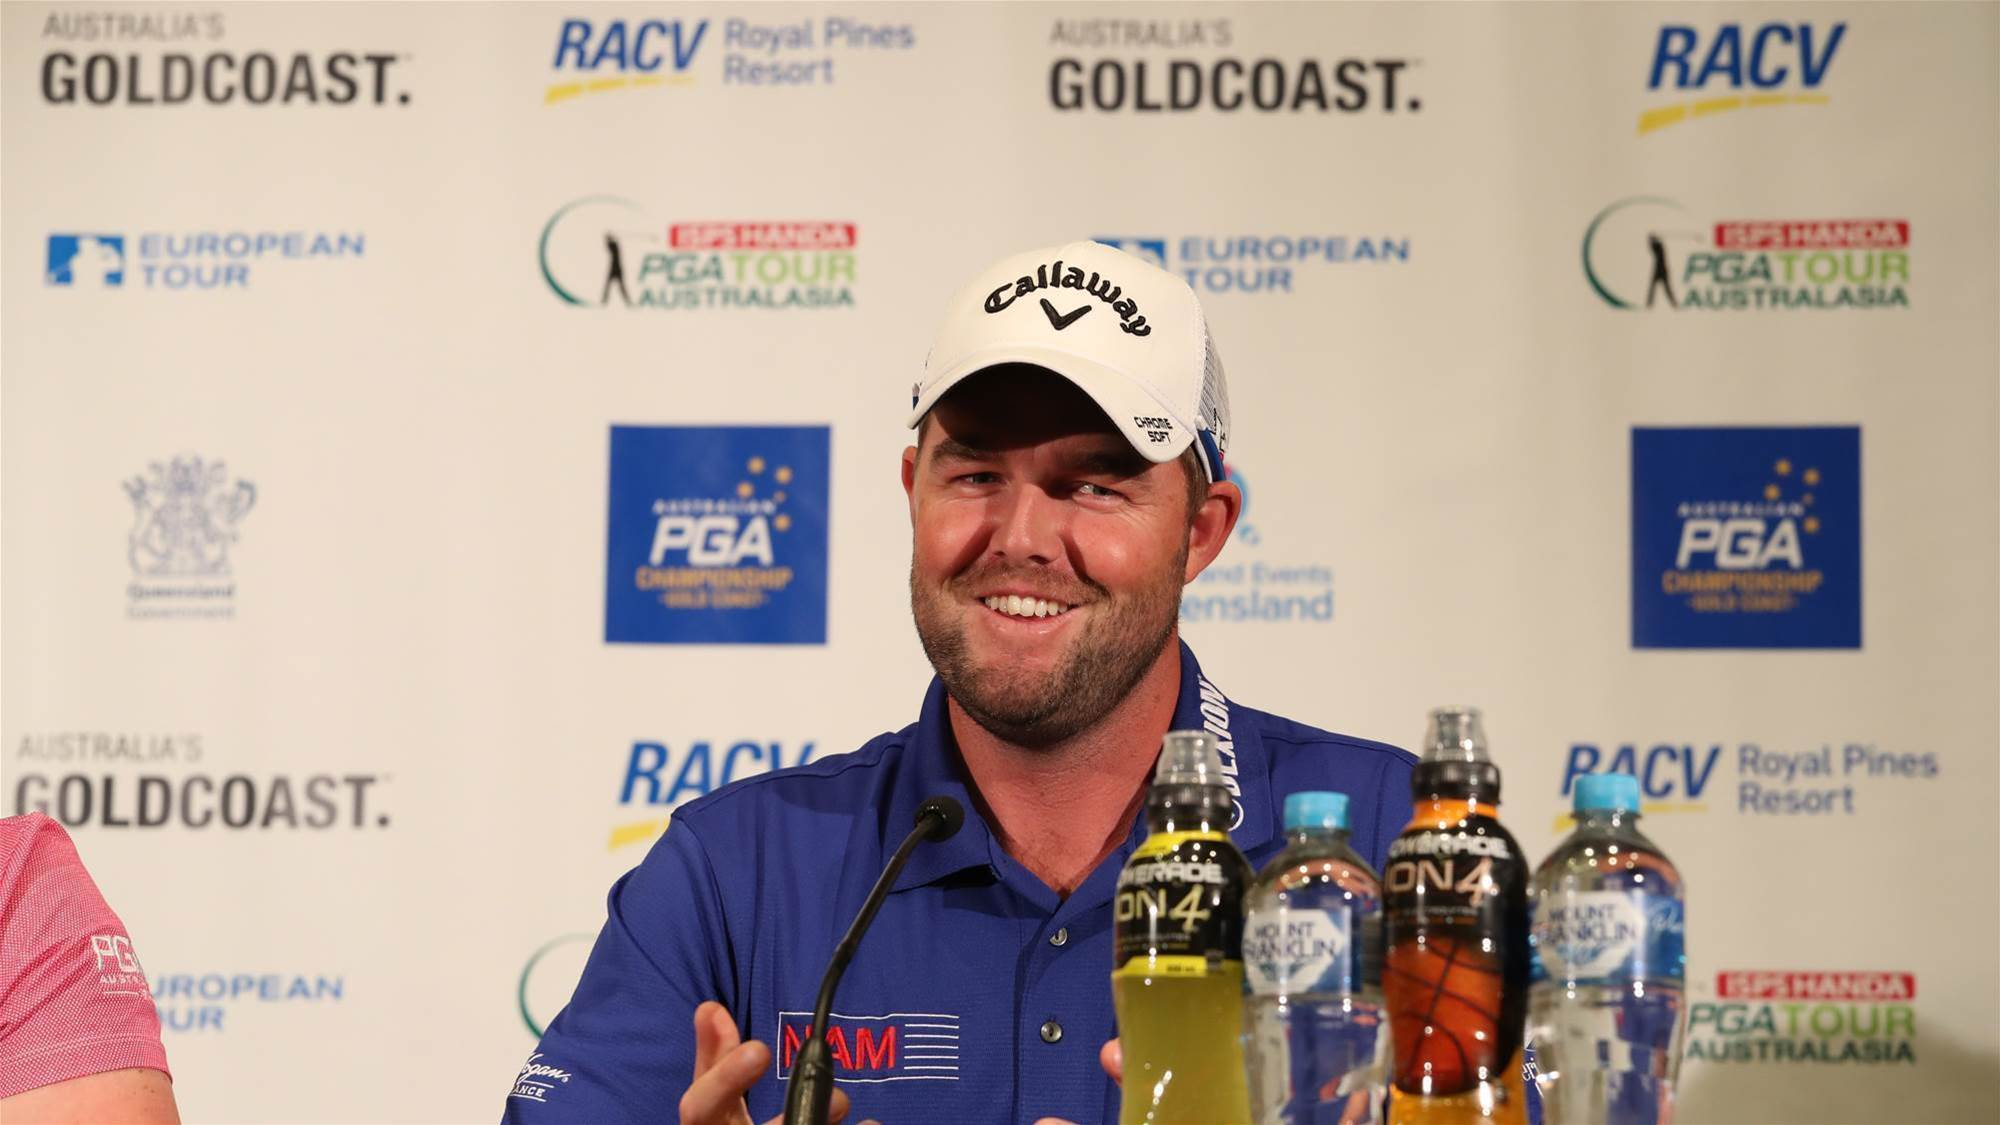 Marc Leishman to play Australian PGA Championship